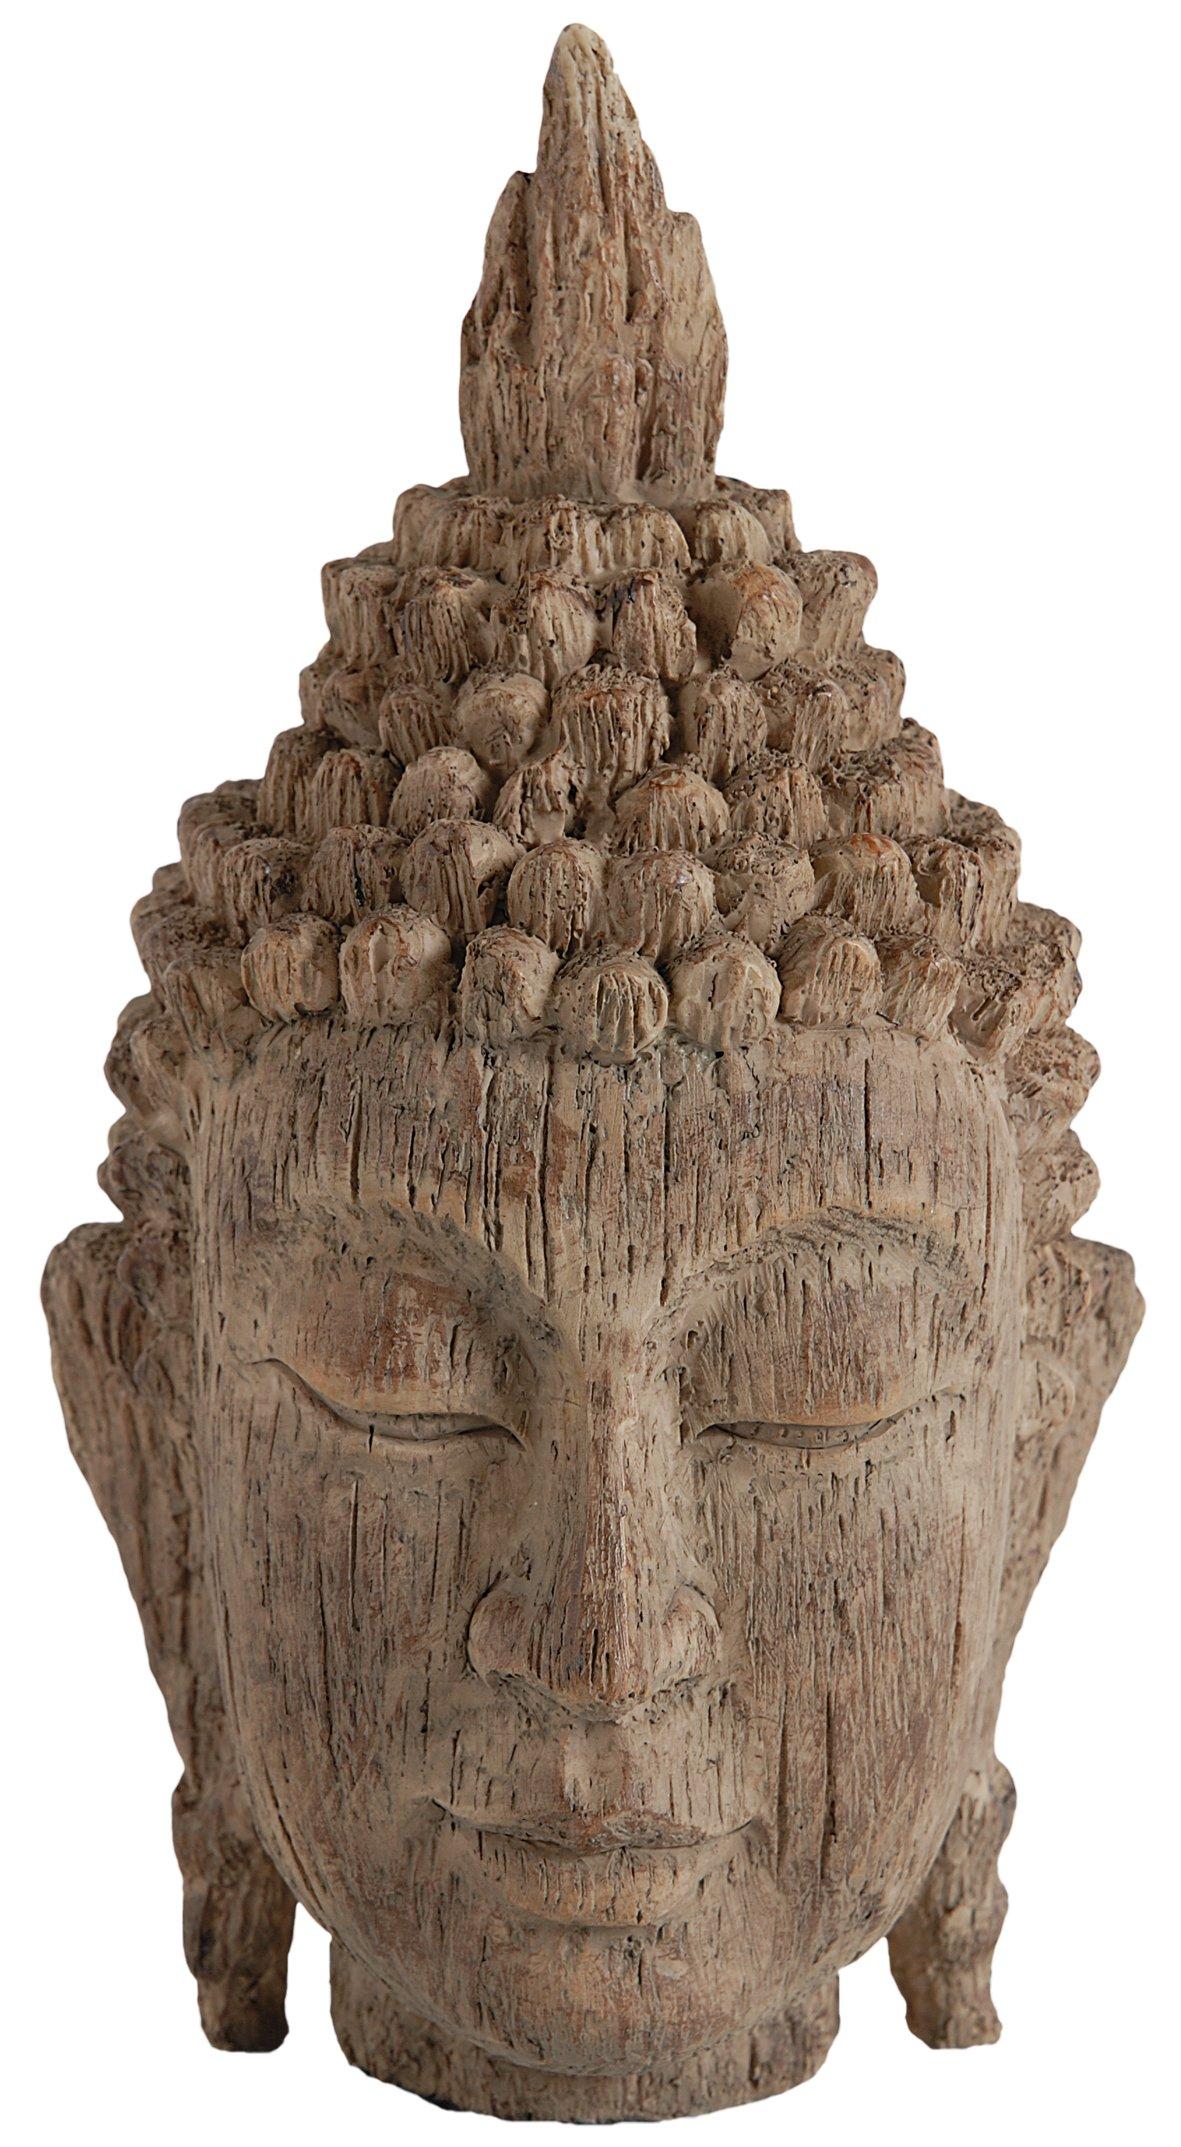 A&B Home 73629 Buddha Head Sculpture, 6.5 by 6.3 by 12-Inch by A&B Home